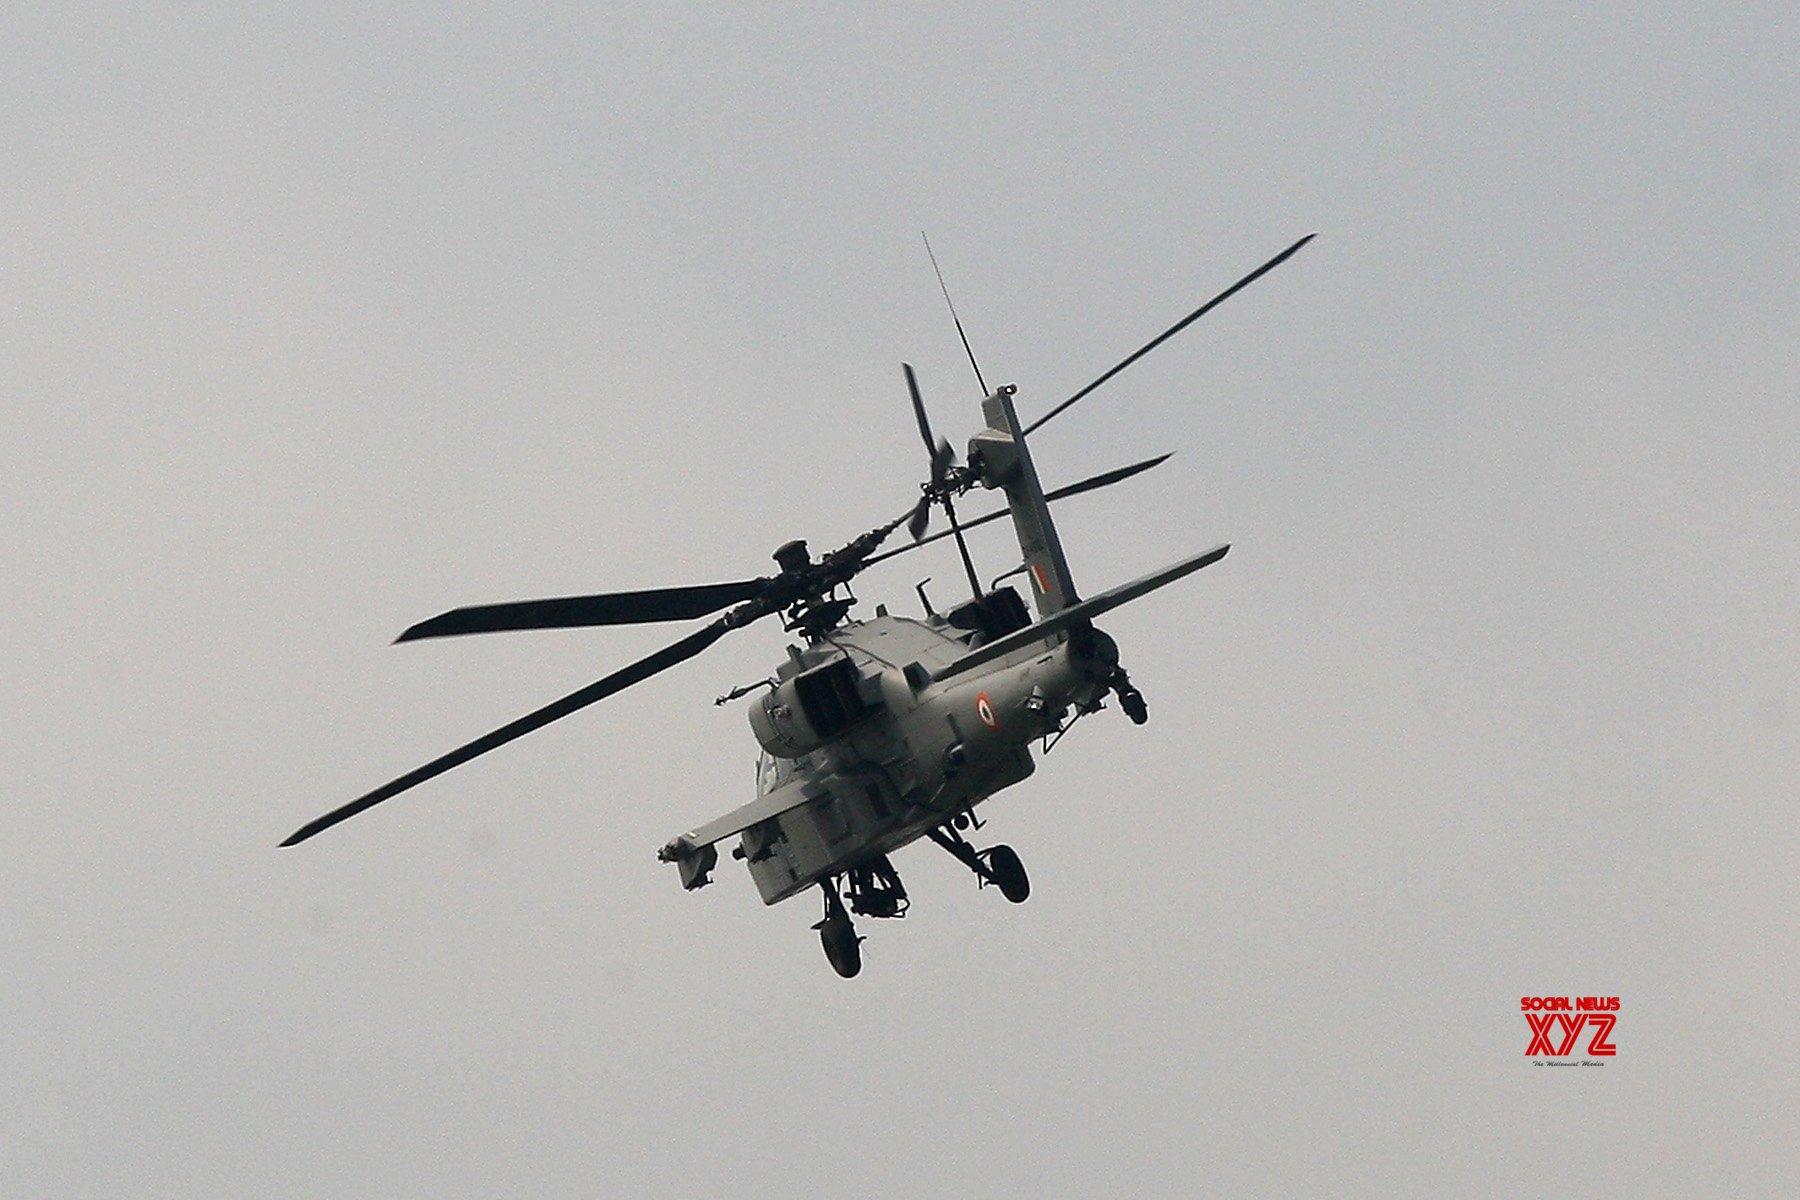 IAF develops locust control system for Mi-17 choppers